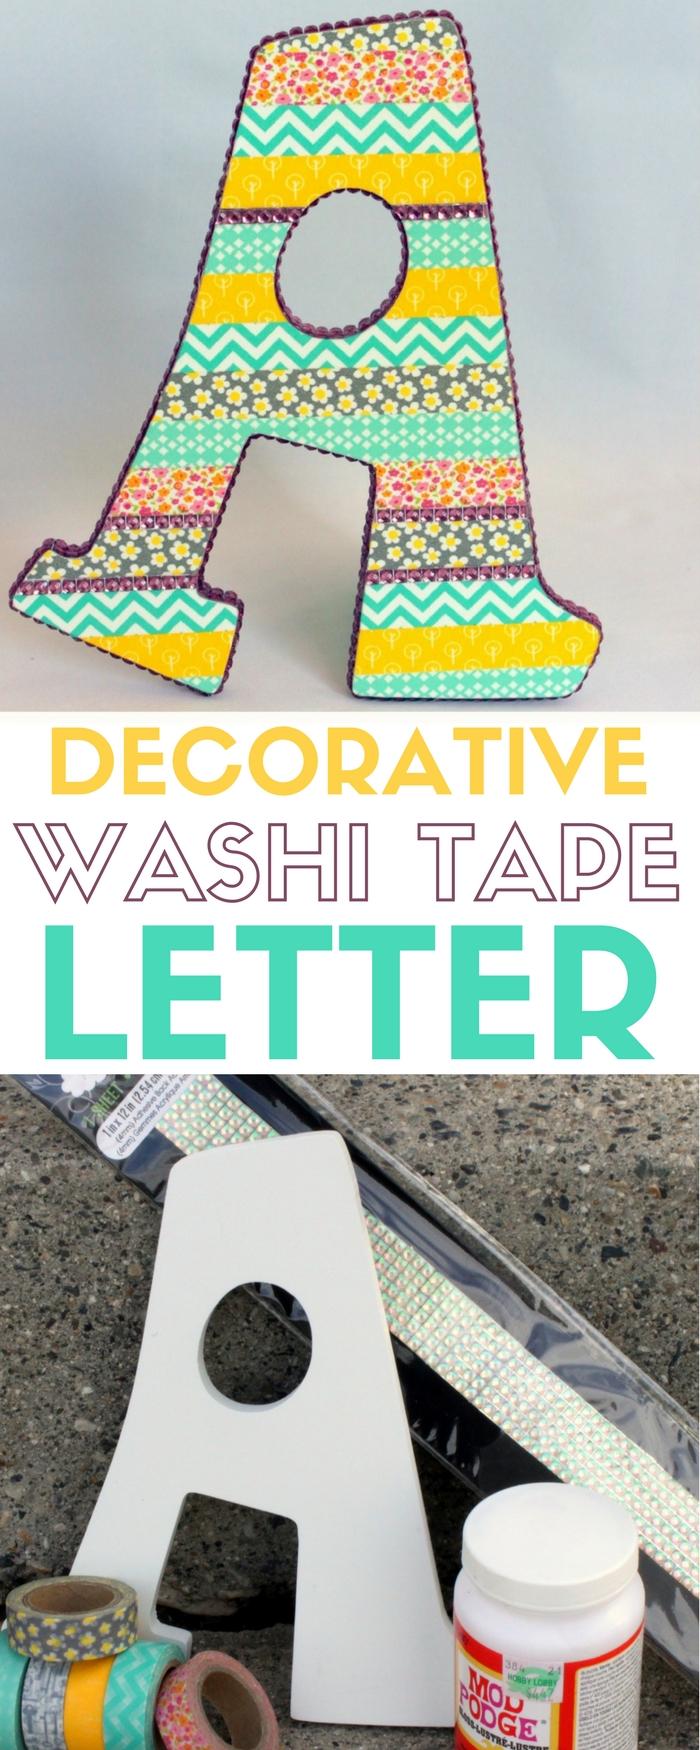 Decorative Washi Tape Letter | Monogram | Mod Podge | Gemz | DIY Crafts | Home Decor